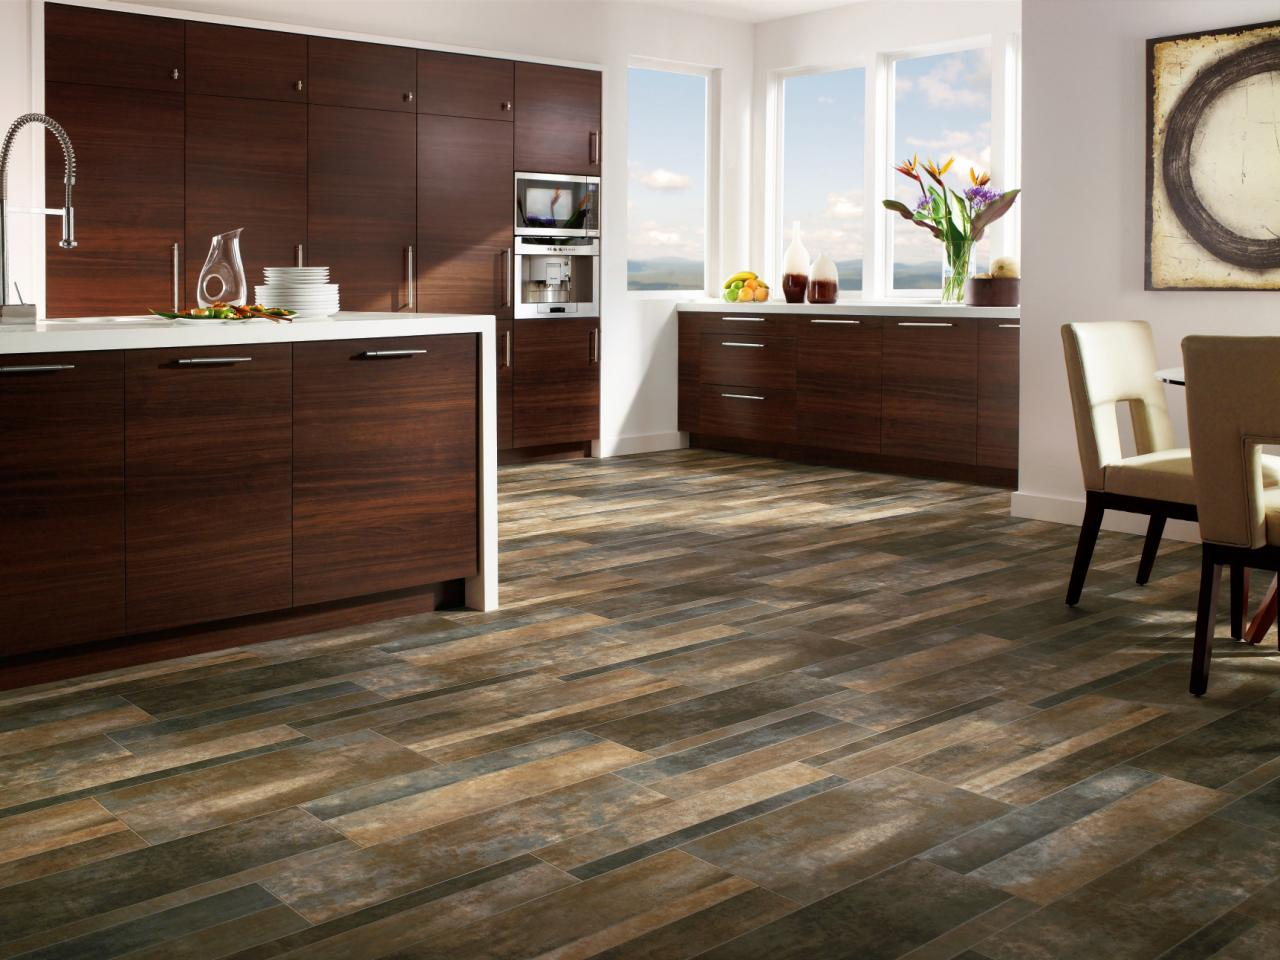 Hardwood Vinyl Flooring High Quality